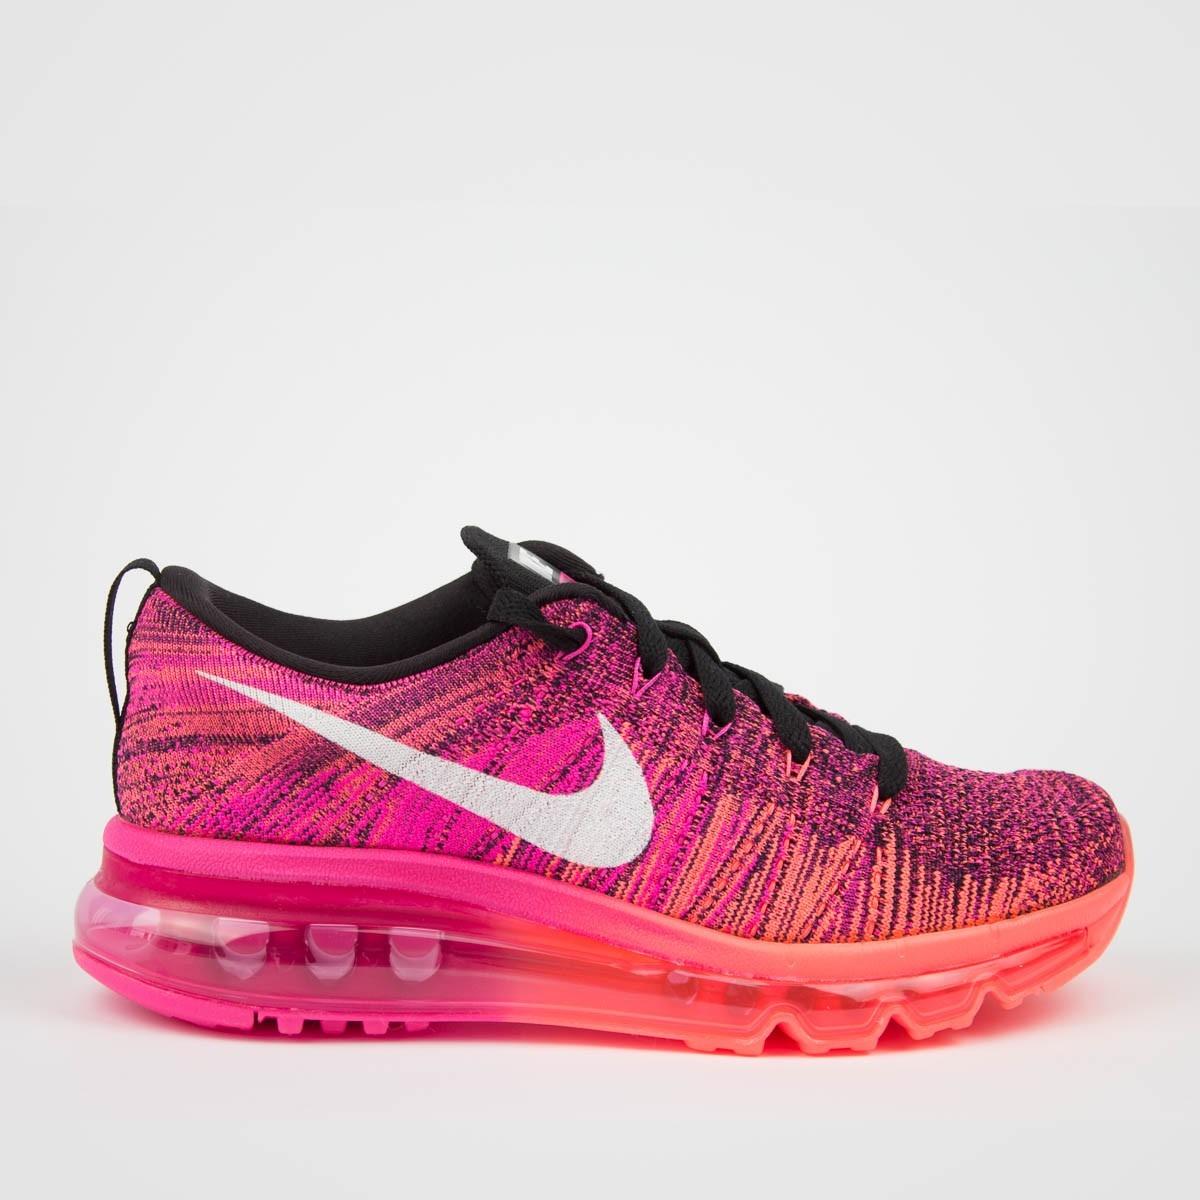 Chaussures Nike Marché Femme Air Max Br Gratuit